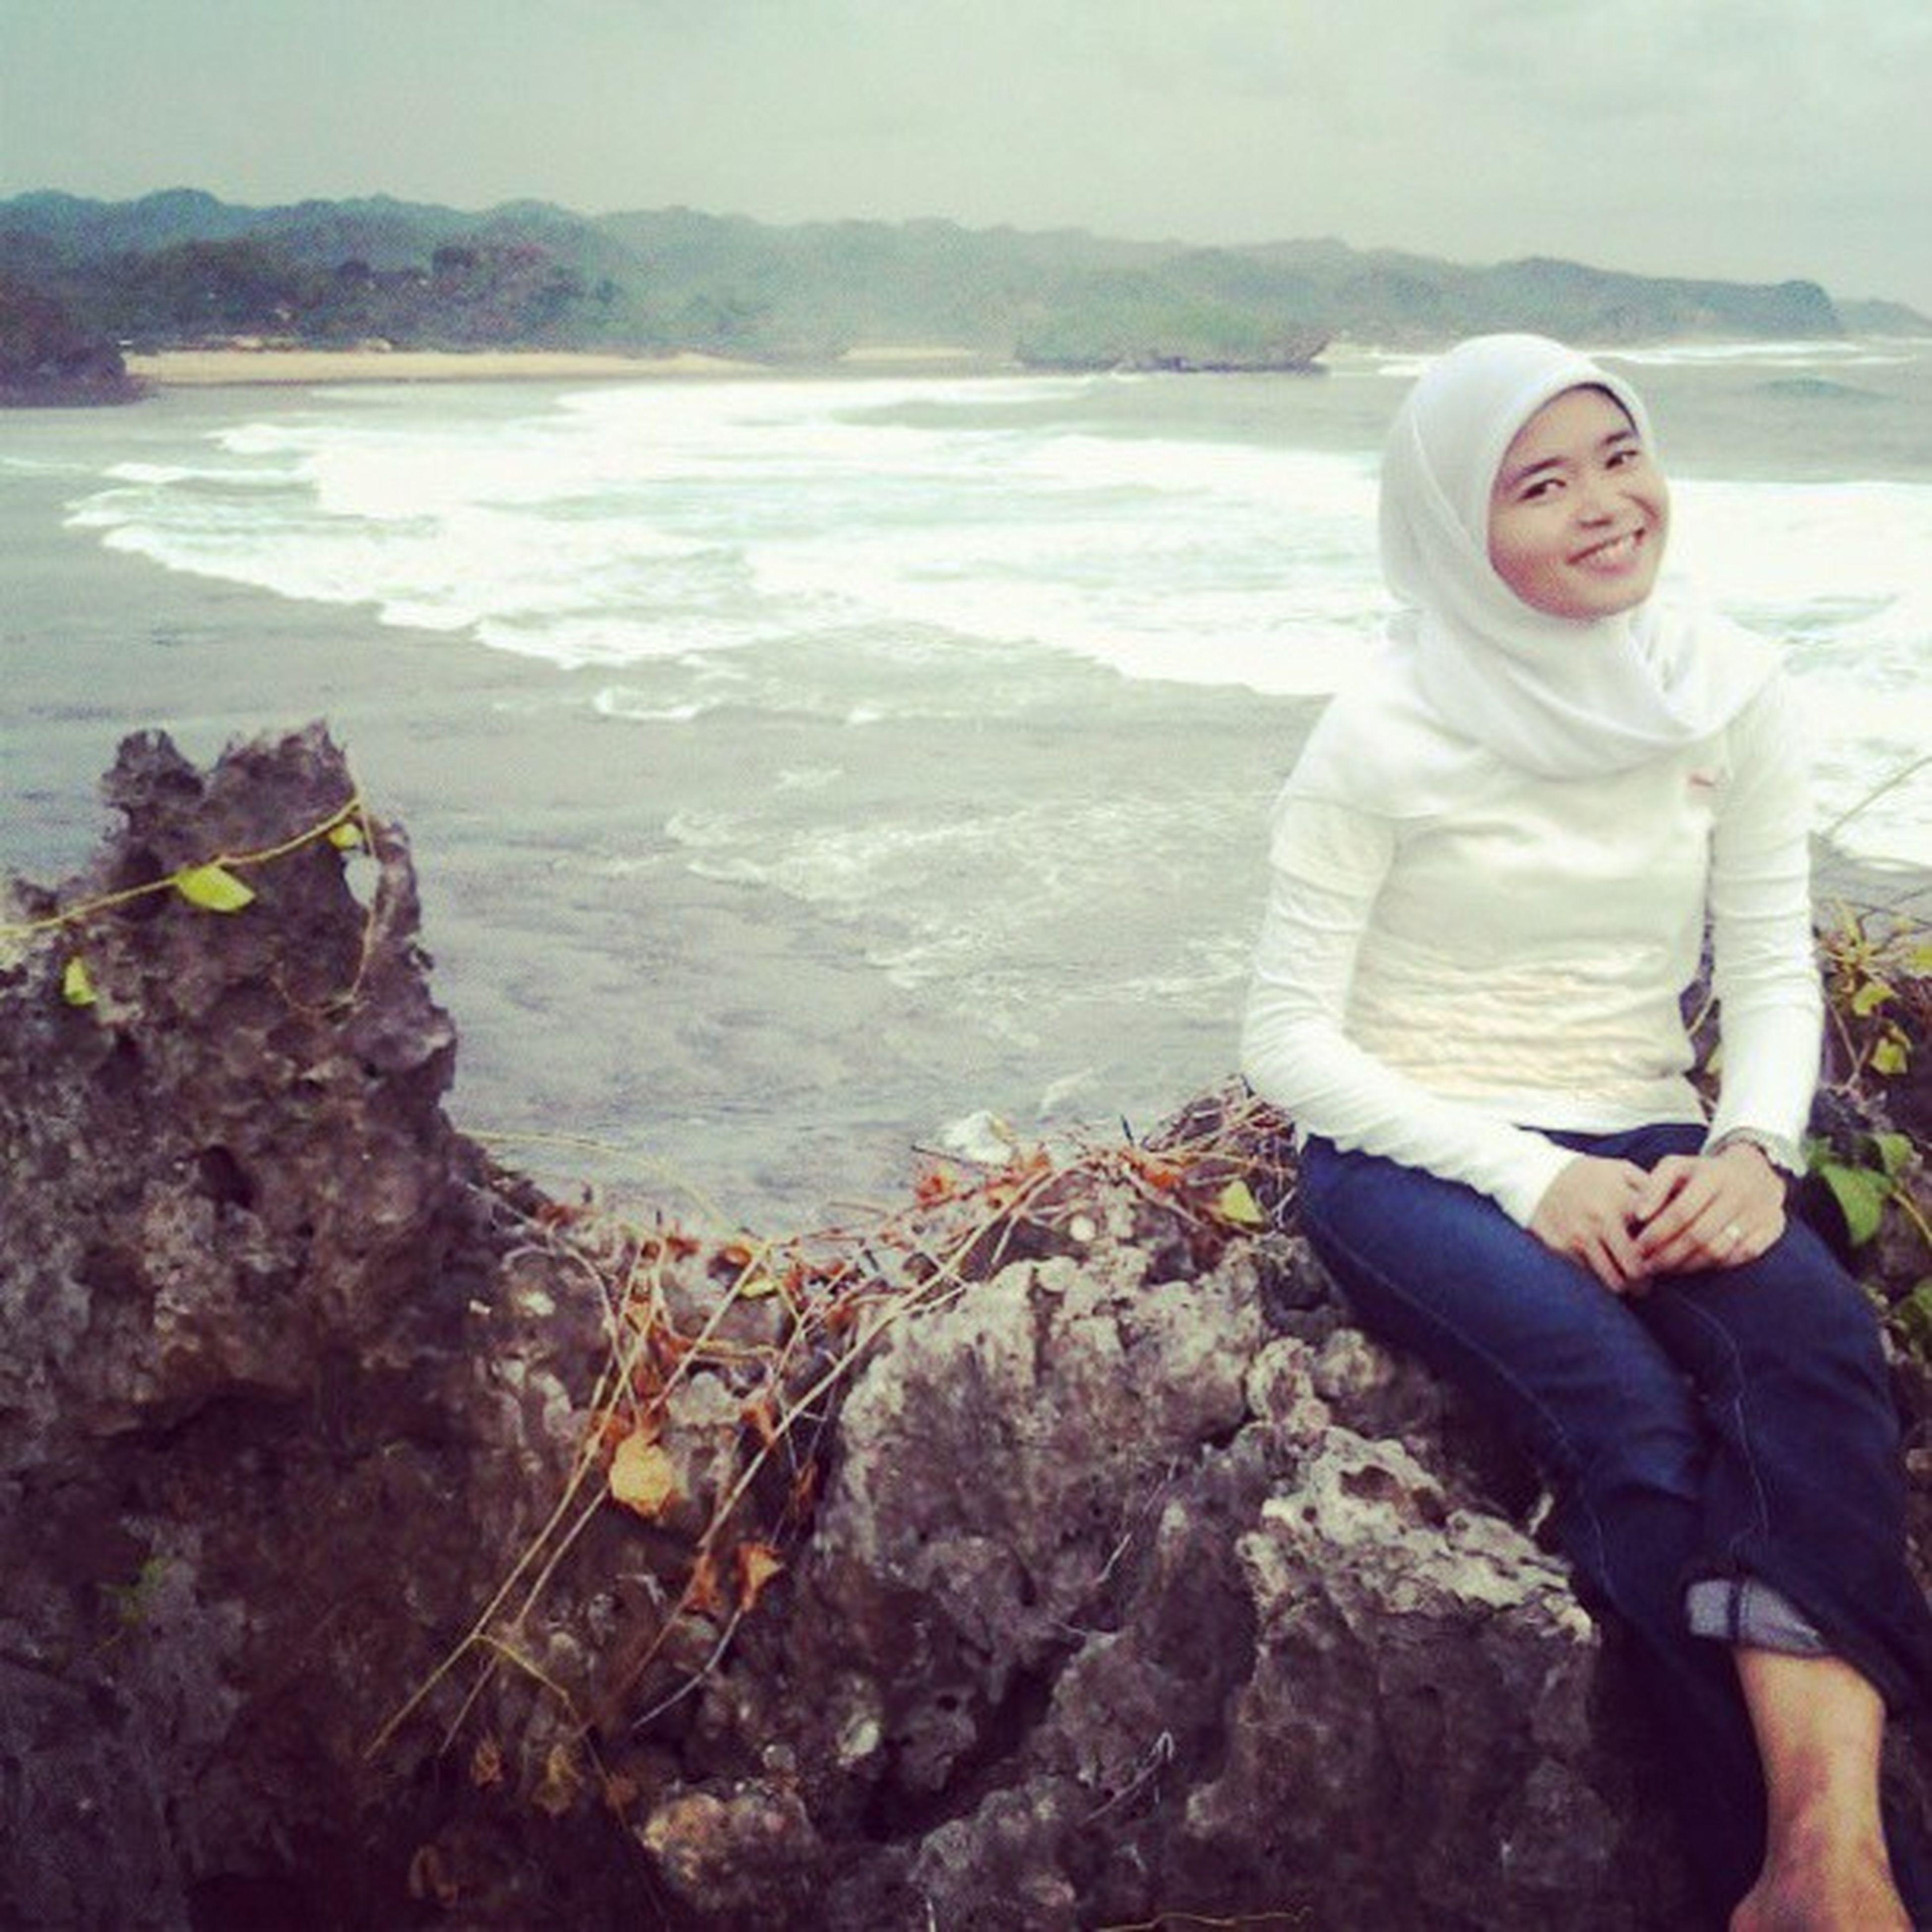 Jogja Beach Pantaikarakal Photograpy instagram longweekend holiday